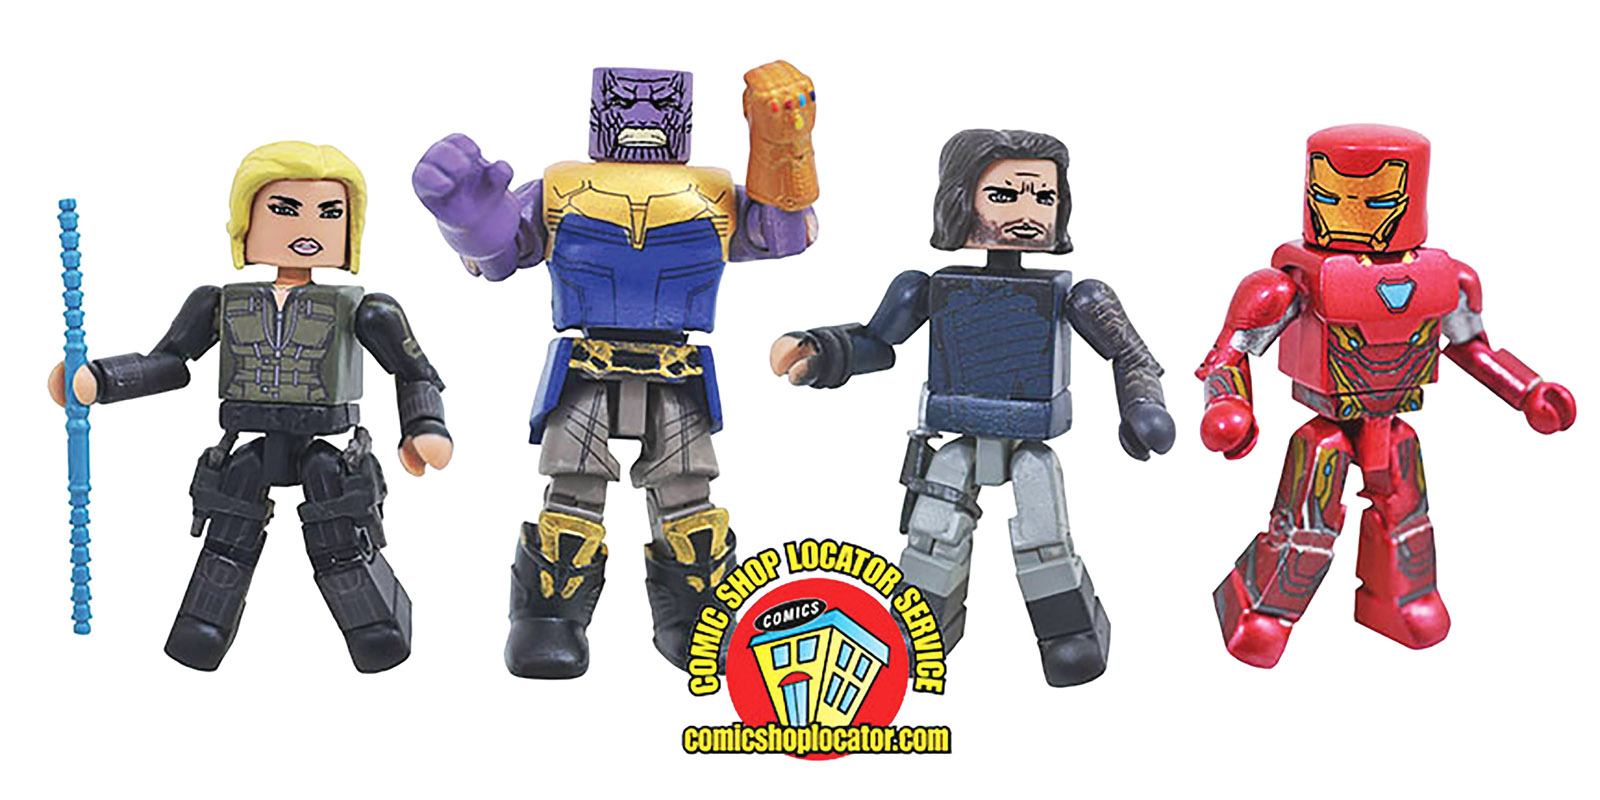 Avengers Infinity War Minimates Box Set